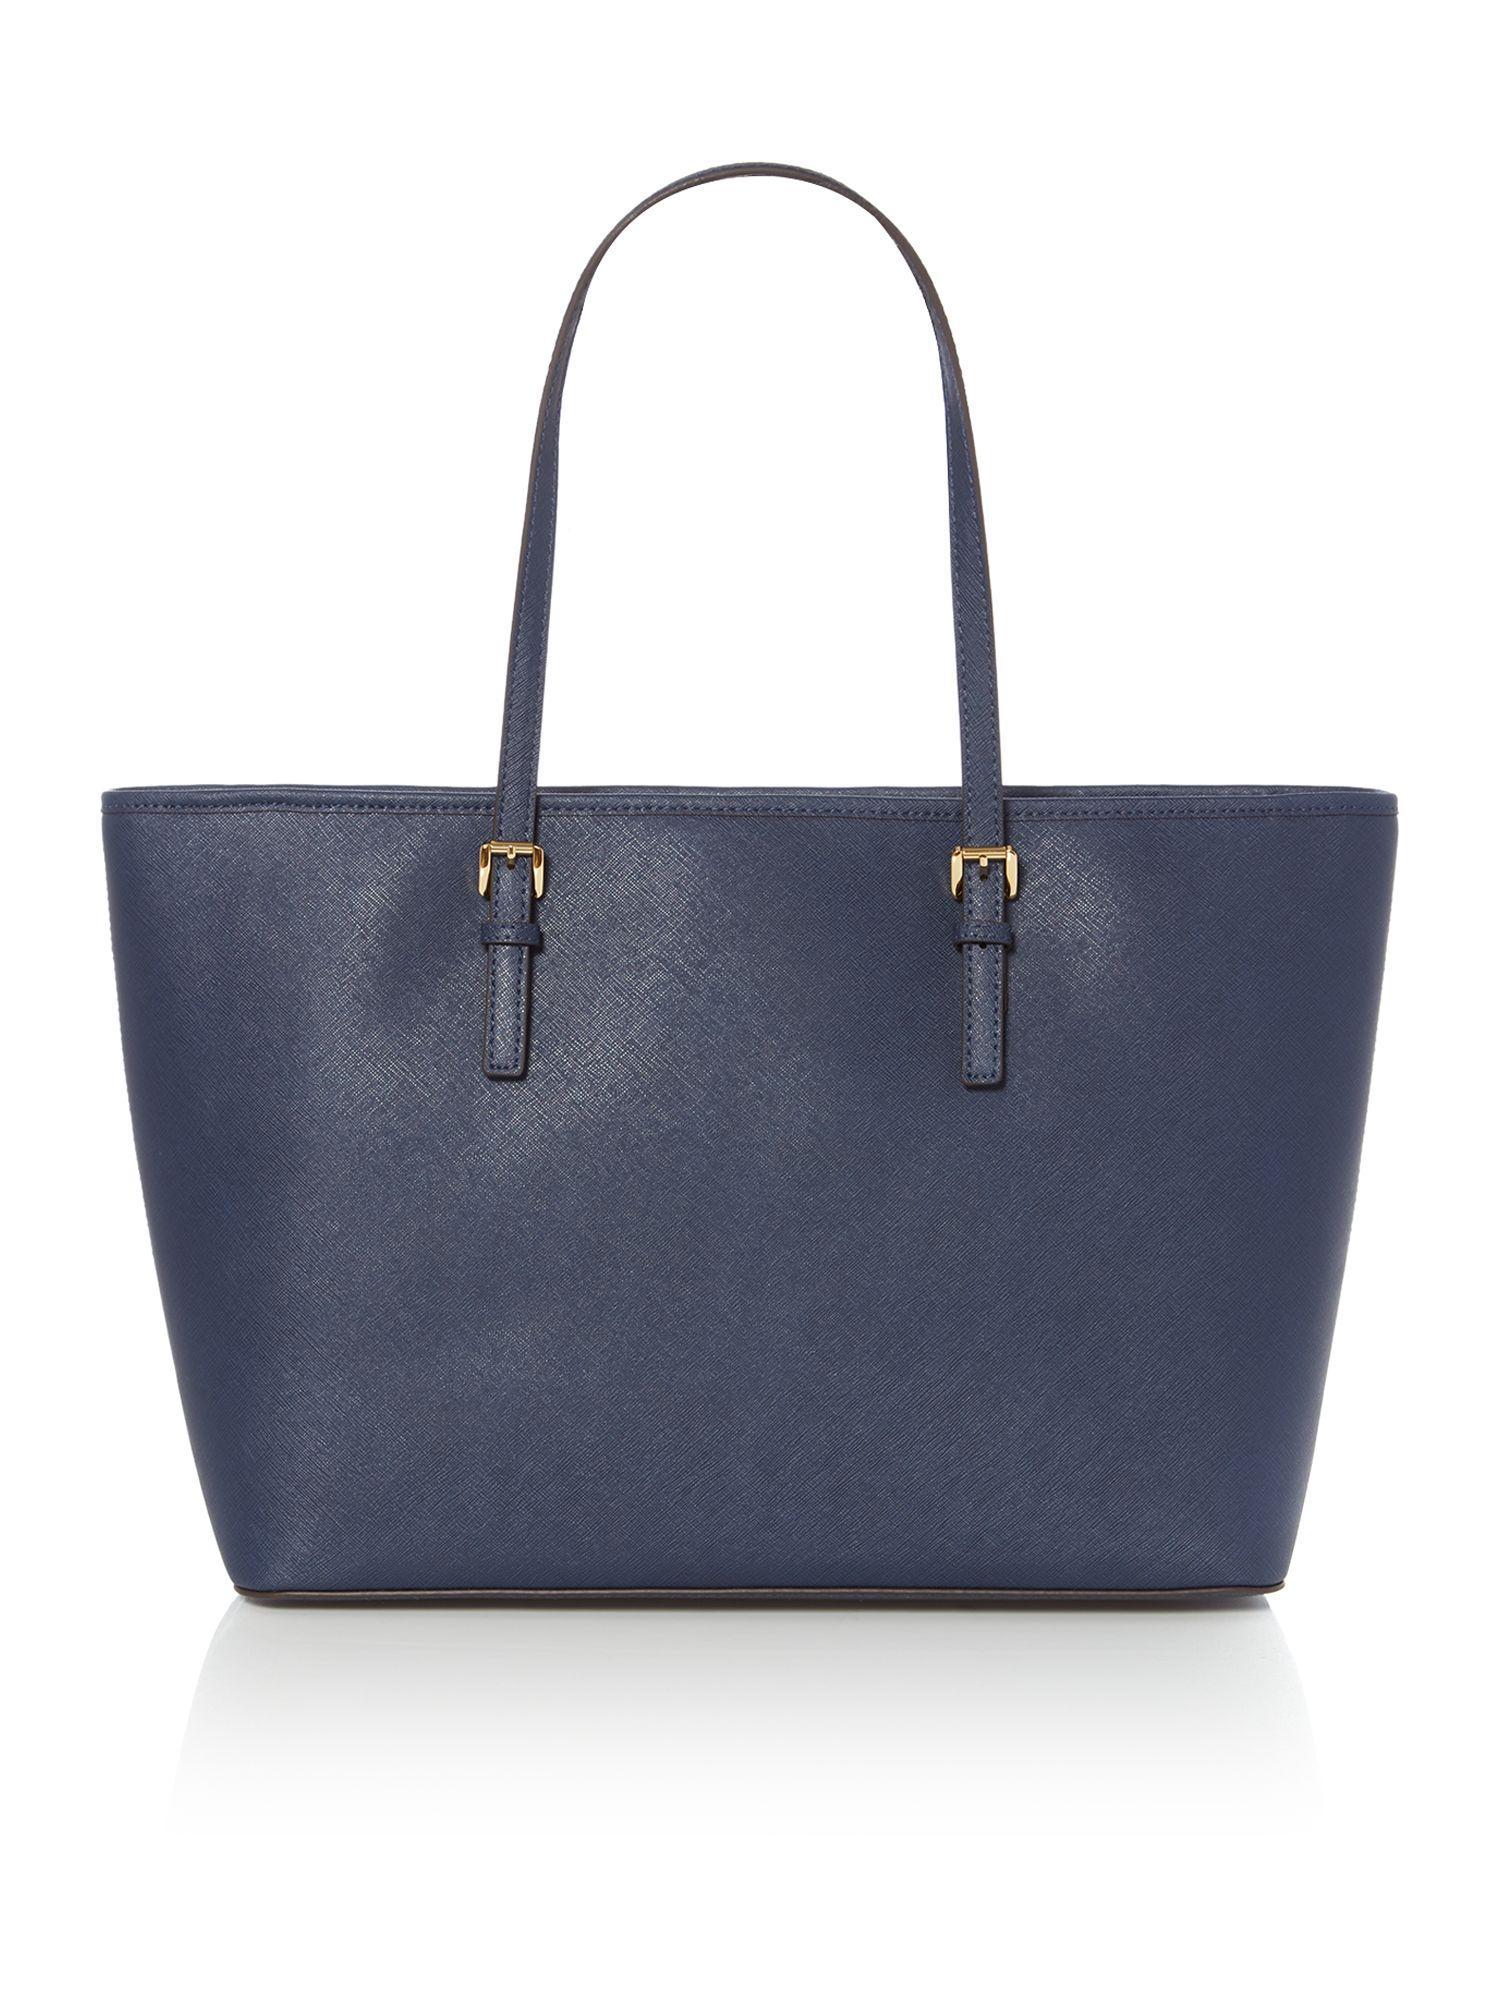 Michael Kors Leather Jet Set Travel Medium Tote Bag in Blue